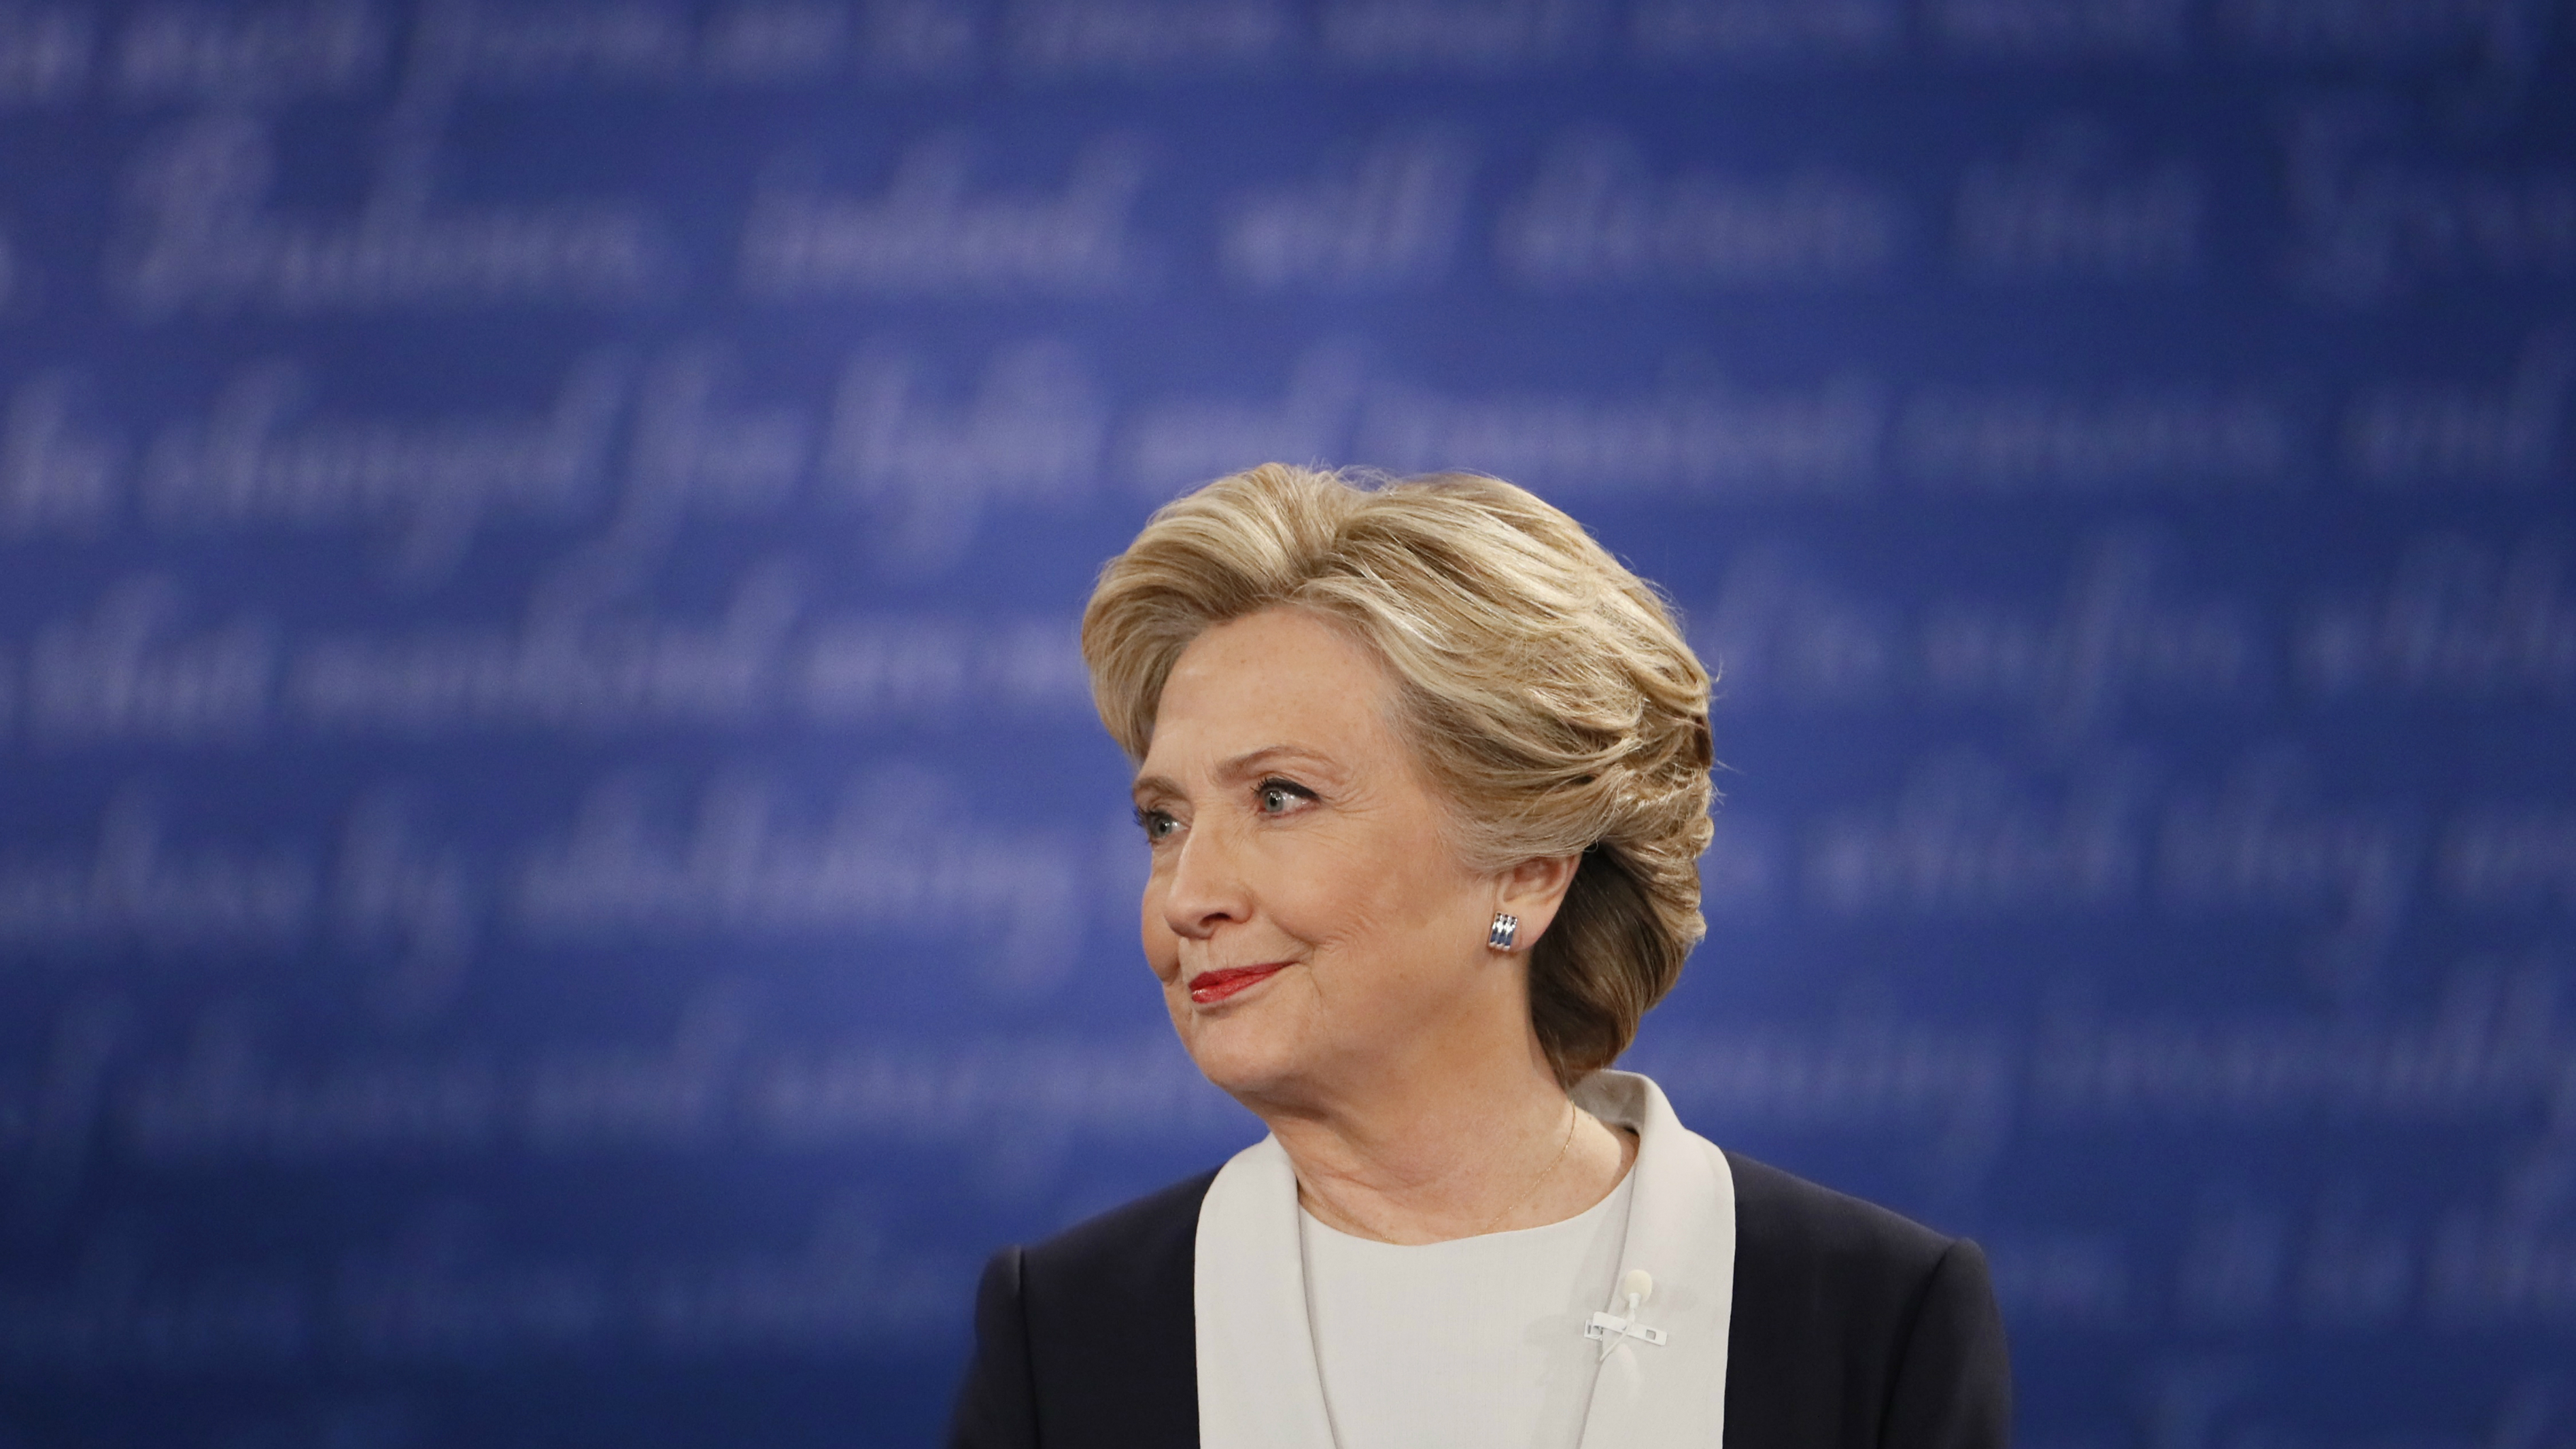 Hillary Clinton in presidential debate against Donald Trump